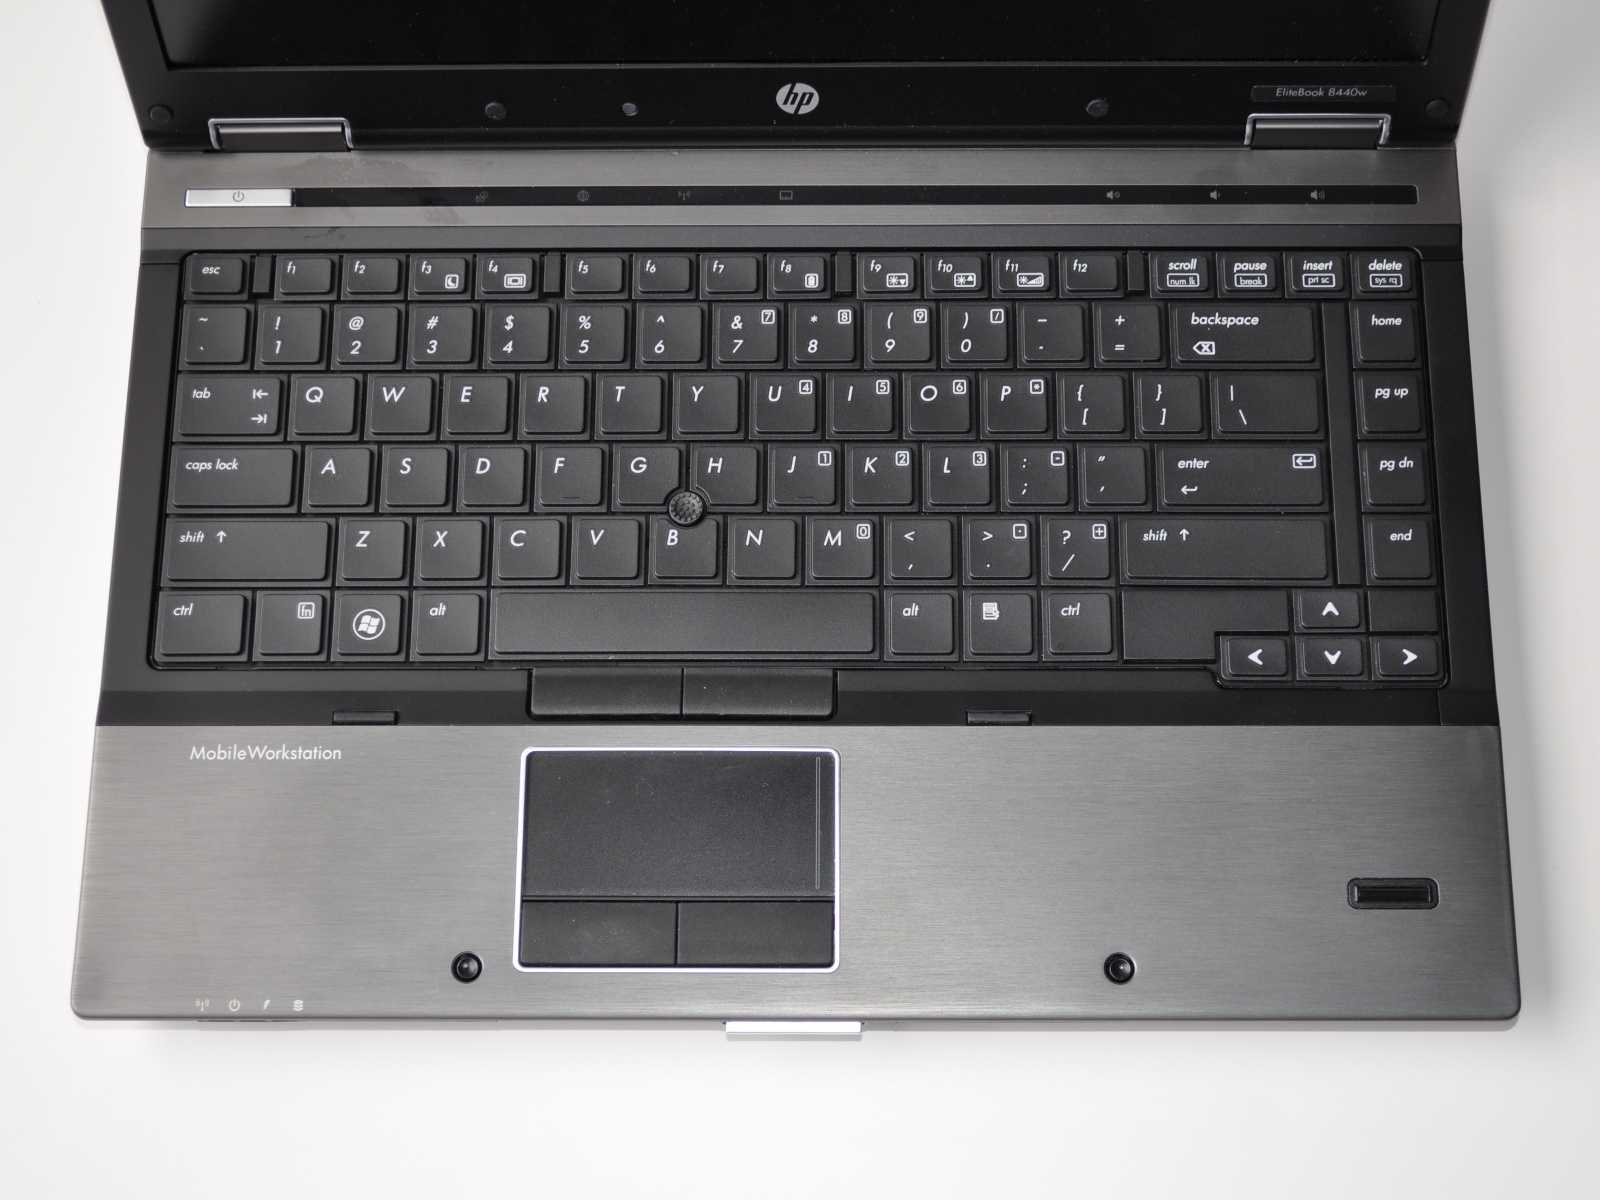 HP EliteBook 8440w - In and Around - HP EliteBook 8440w: On